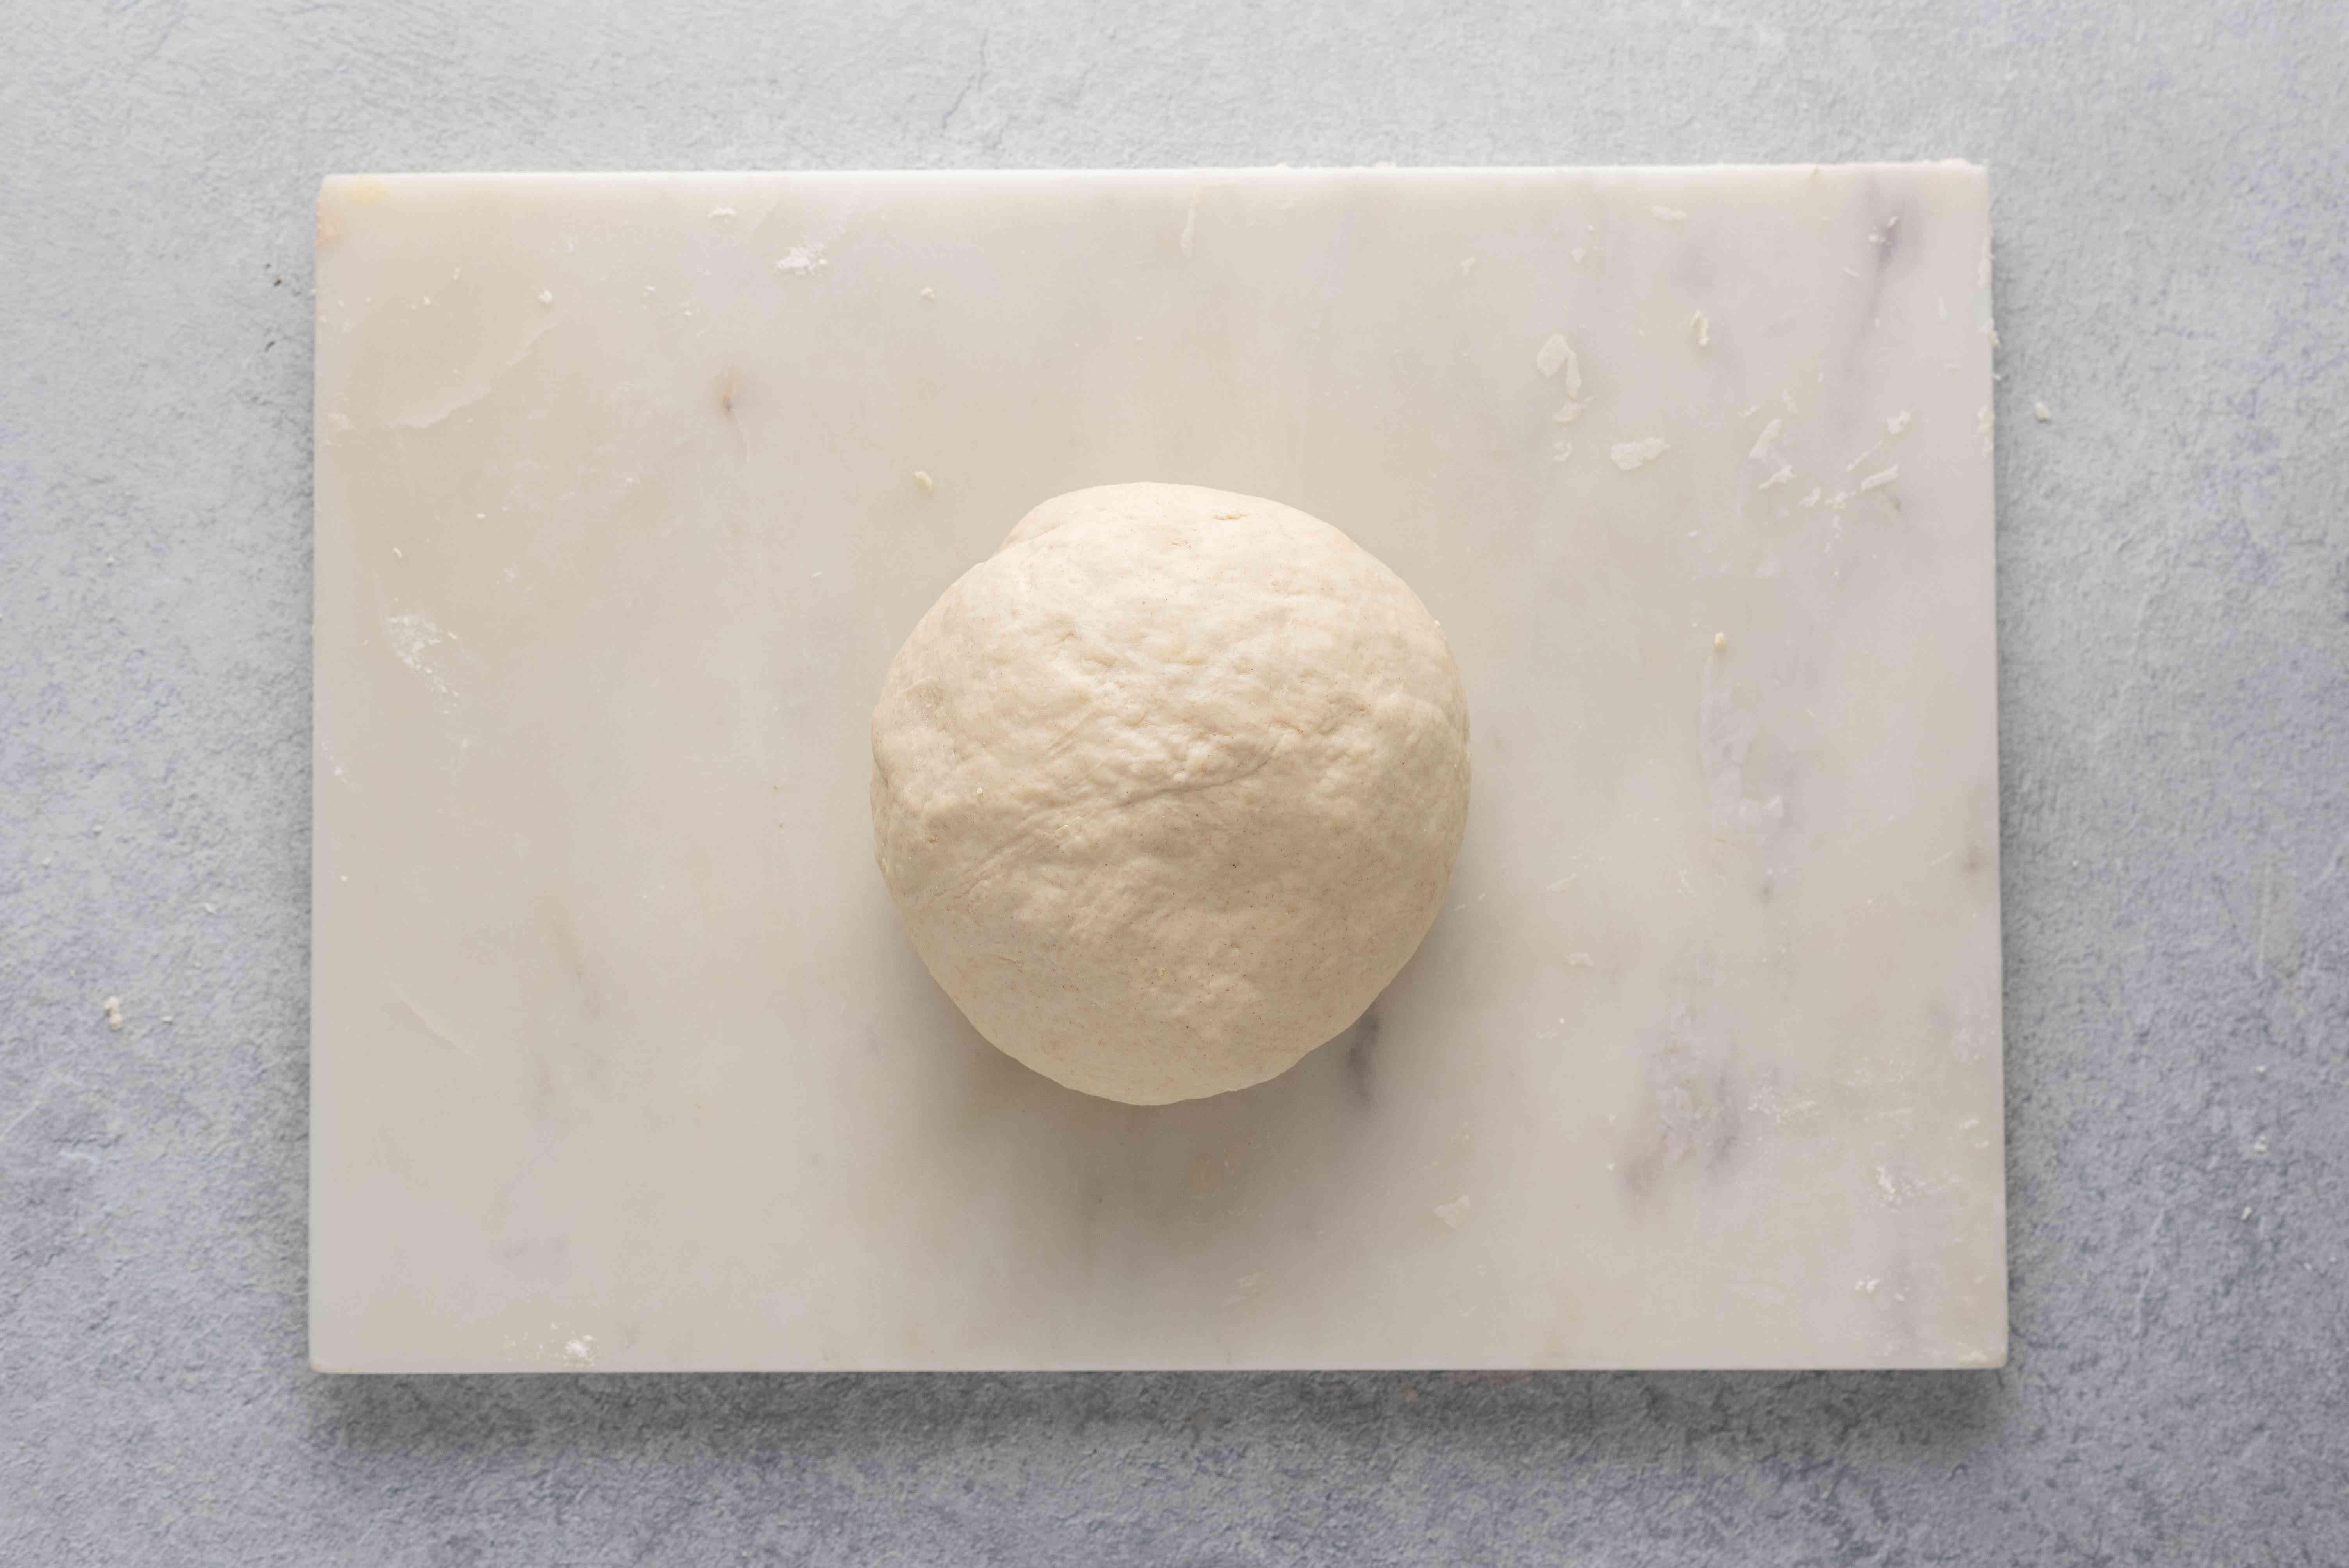 dough ball on a cutting board